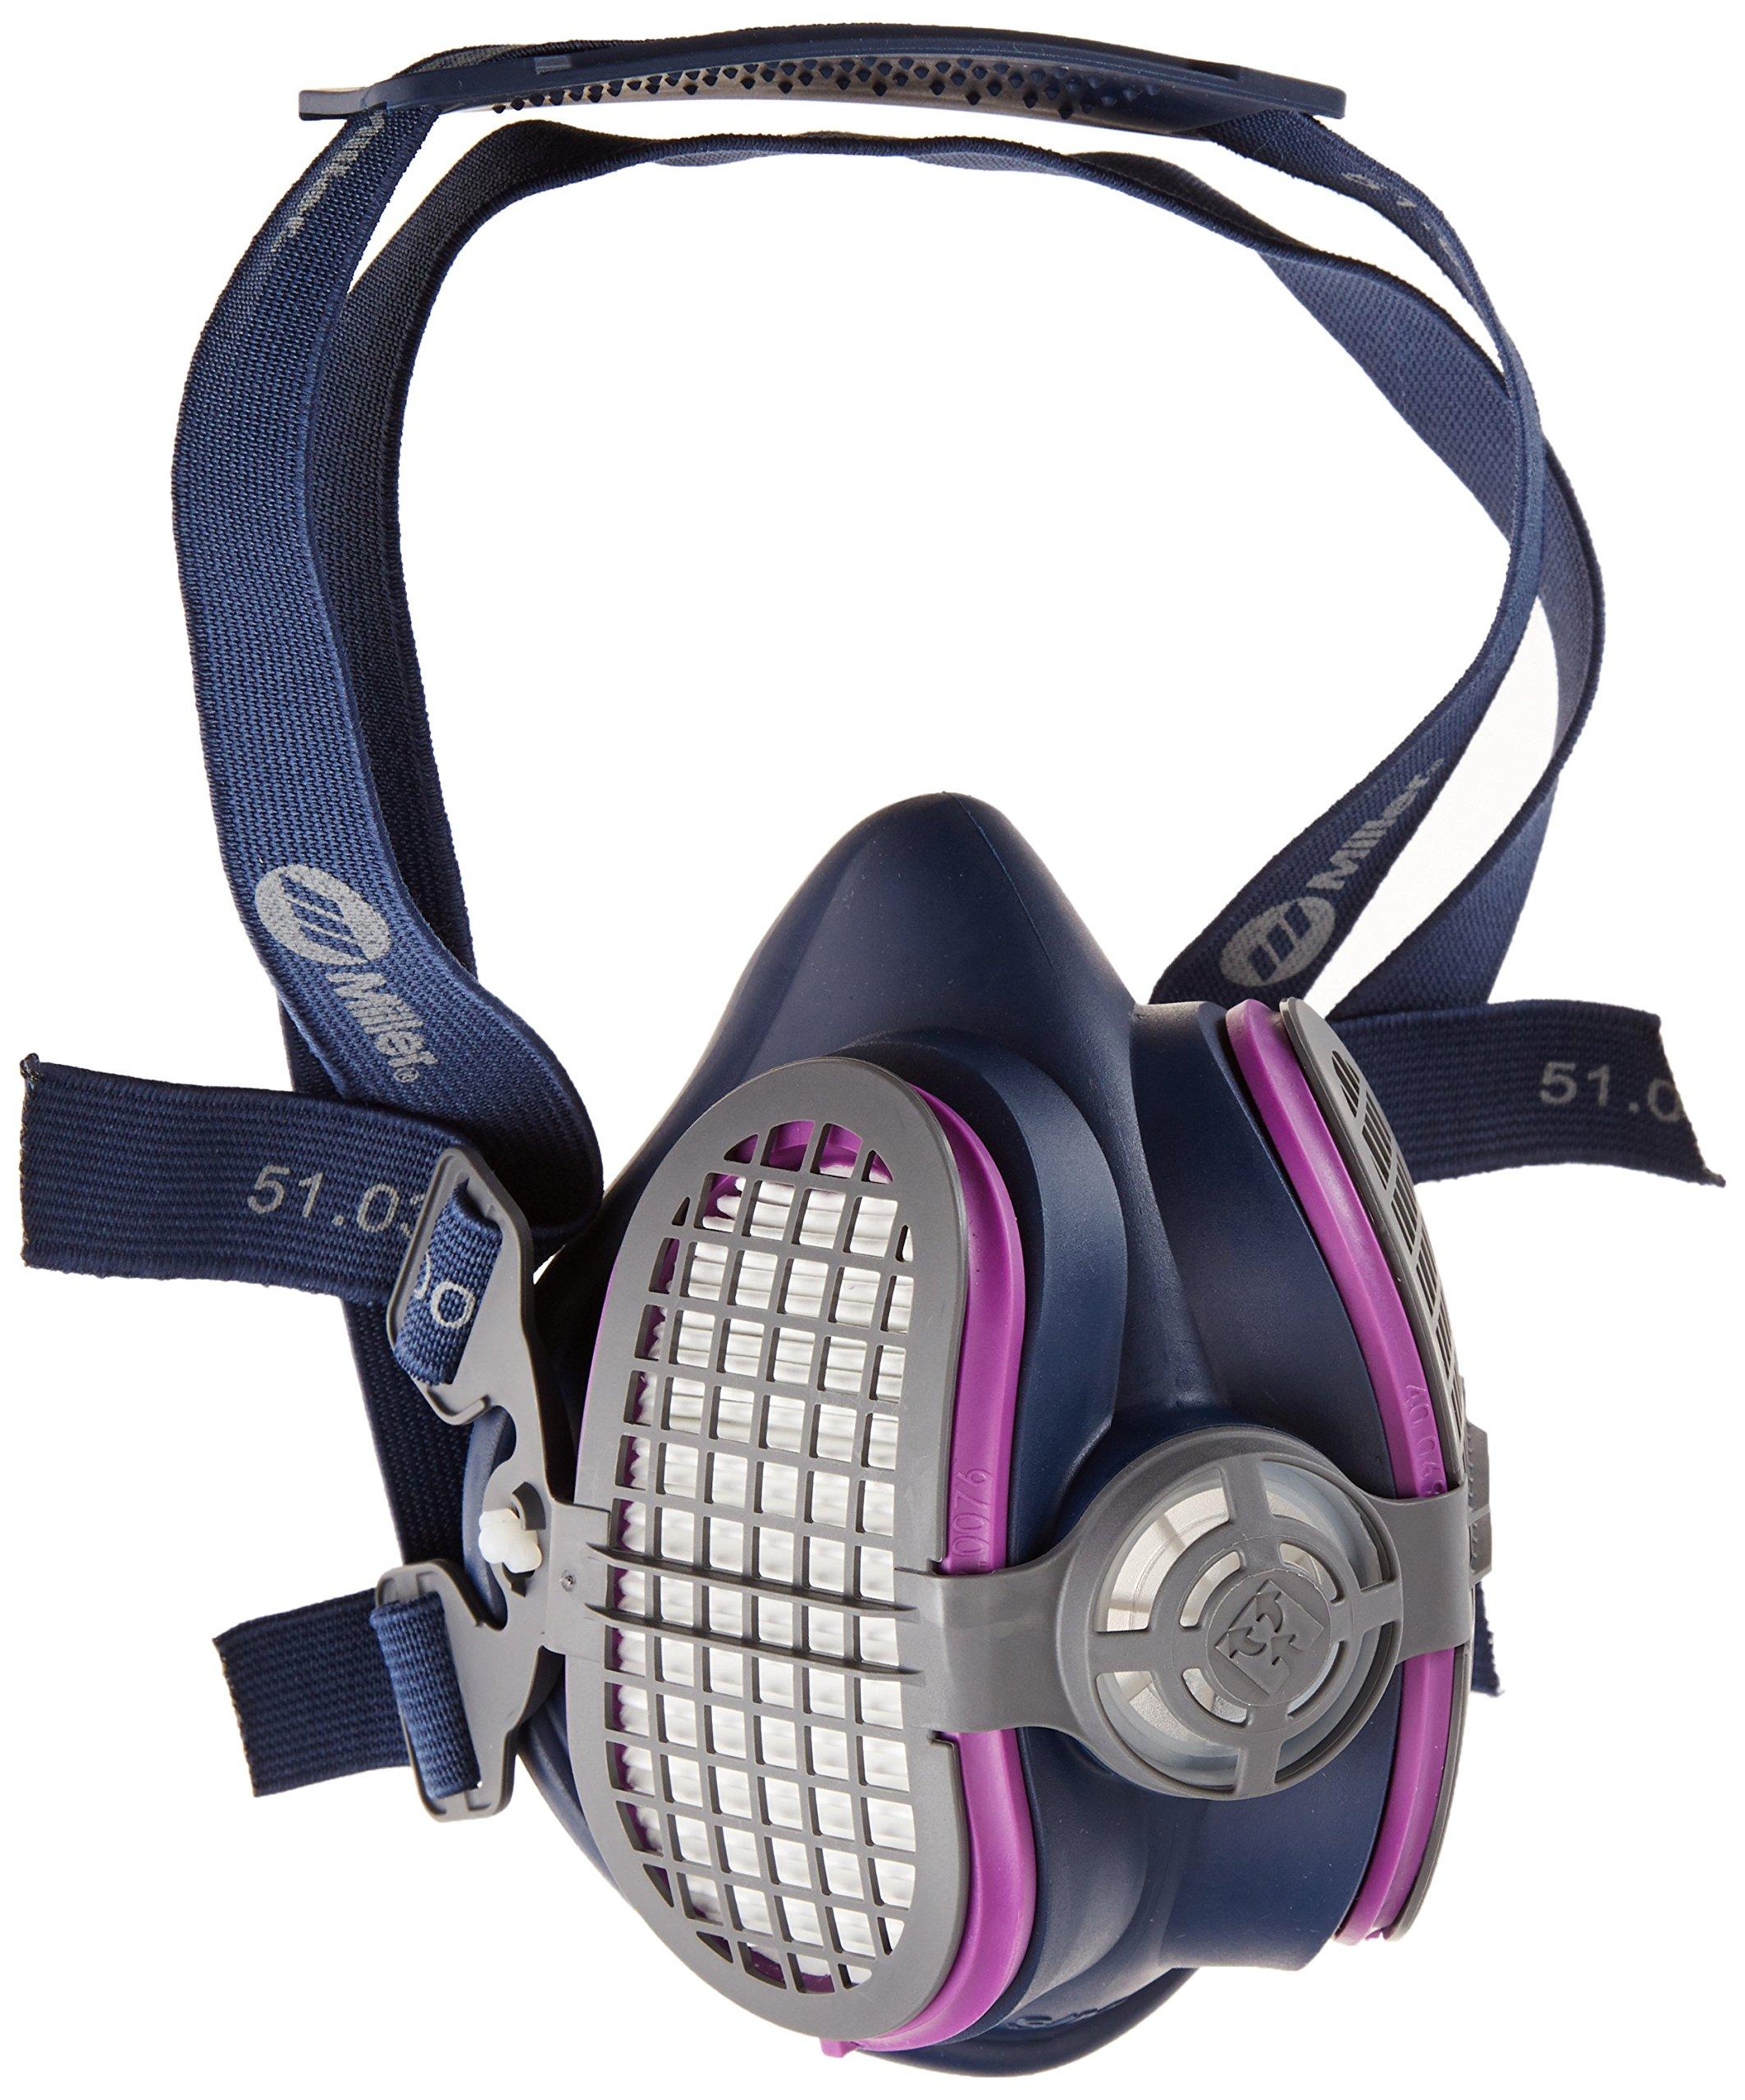 Half Mask Respirator Size Small/Medium